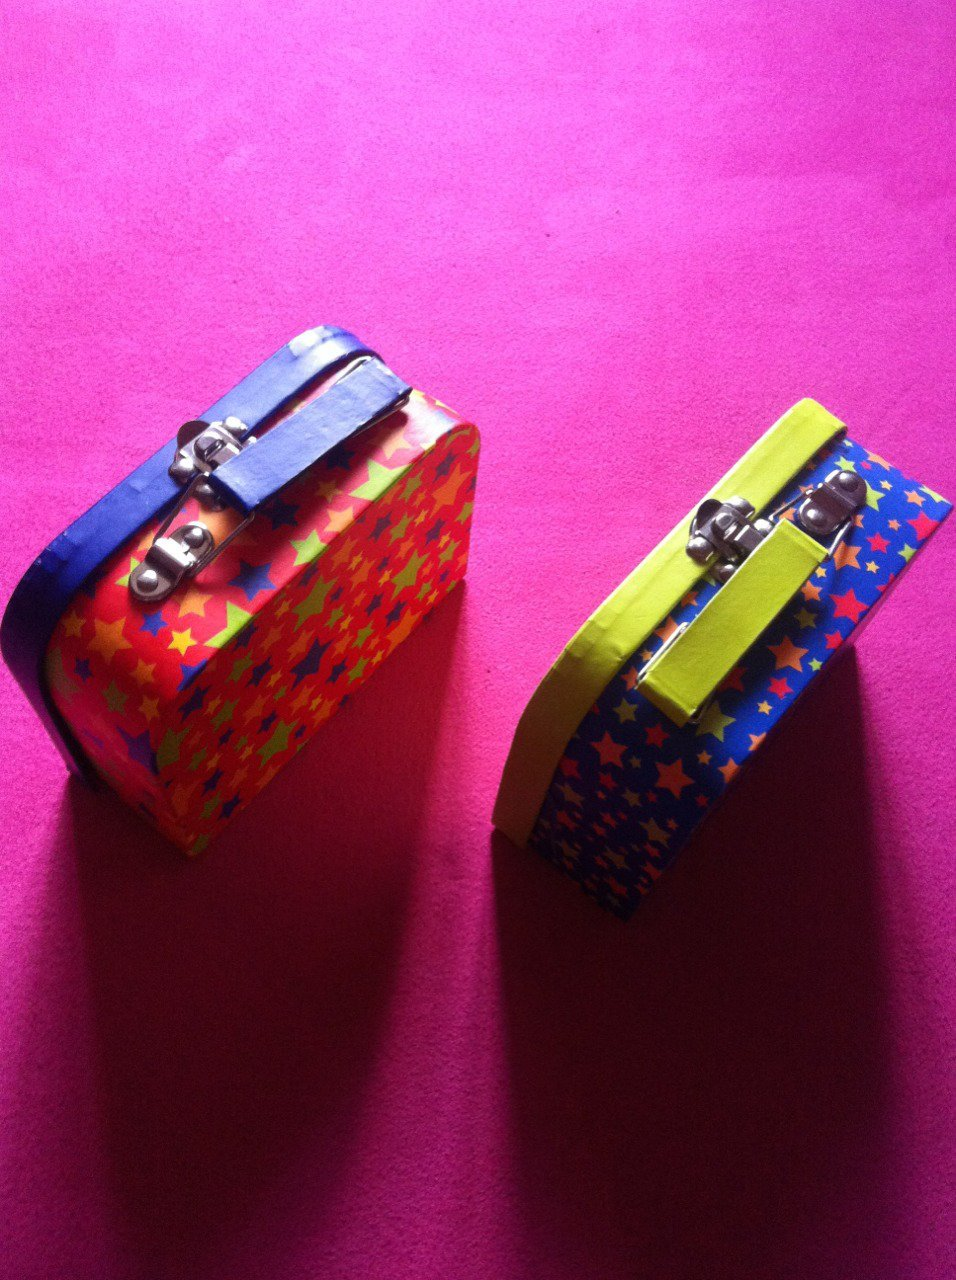 [Family 館]新潮雙色珠寶文具 收納手提盒 2色